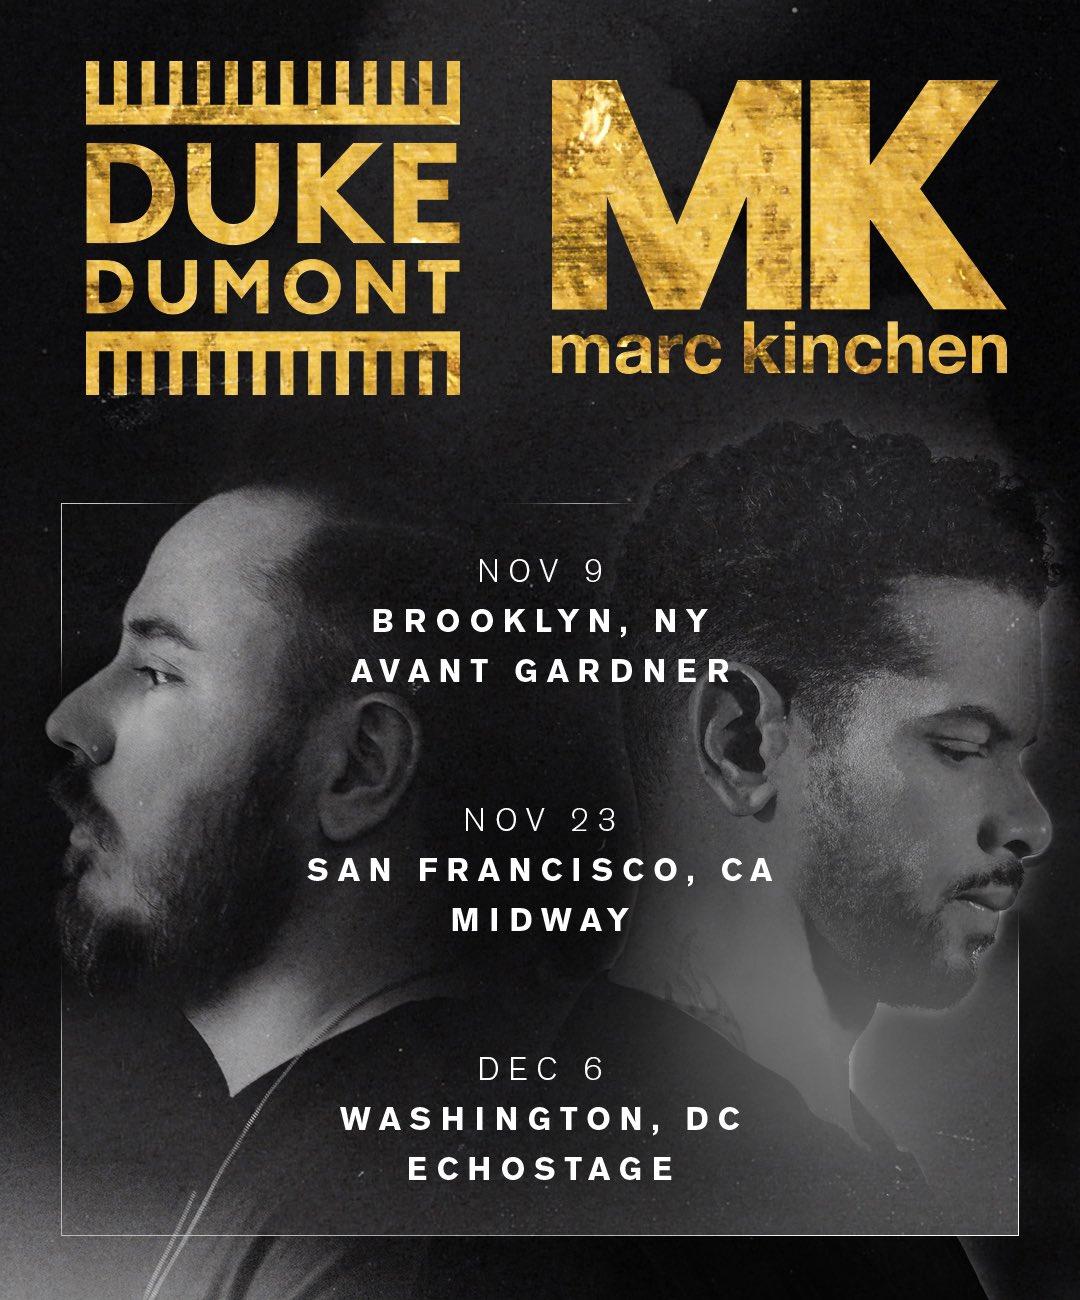 MK & Duke Dumont Announce Exclusive Events in NYC, San Francisco and Washington D.C. ile ilgili görsel sonucu